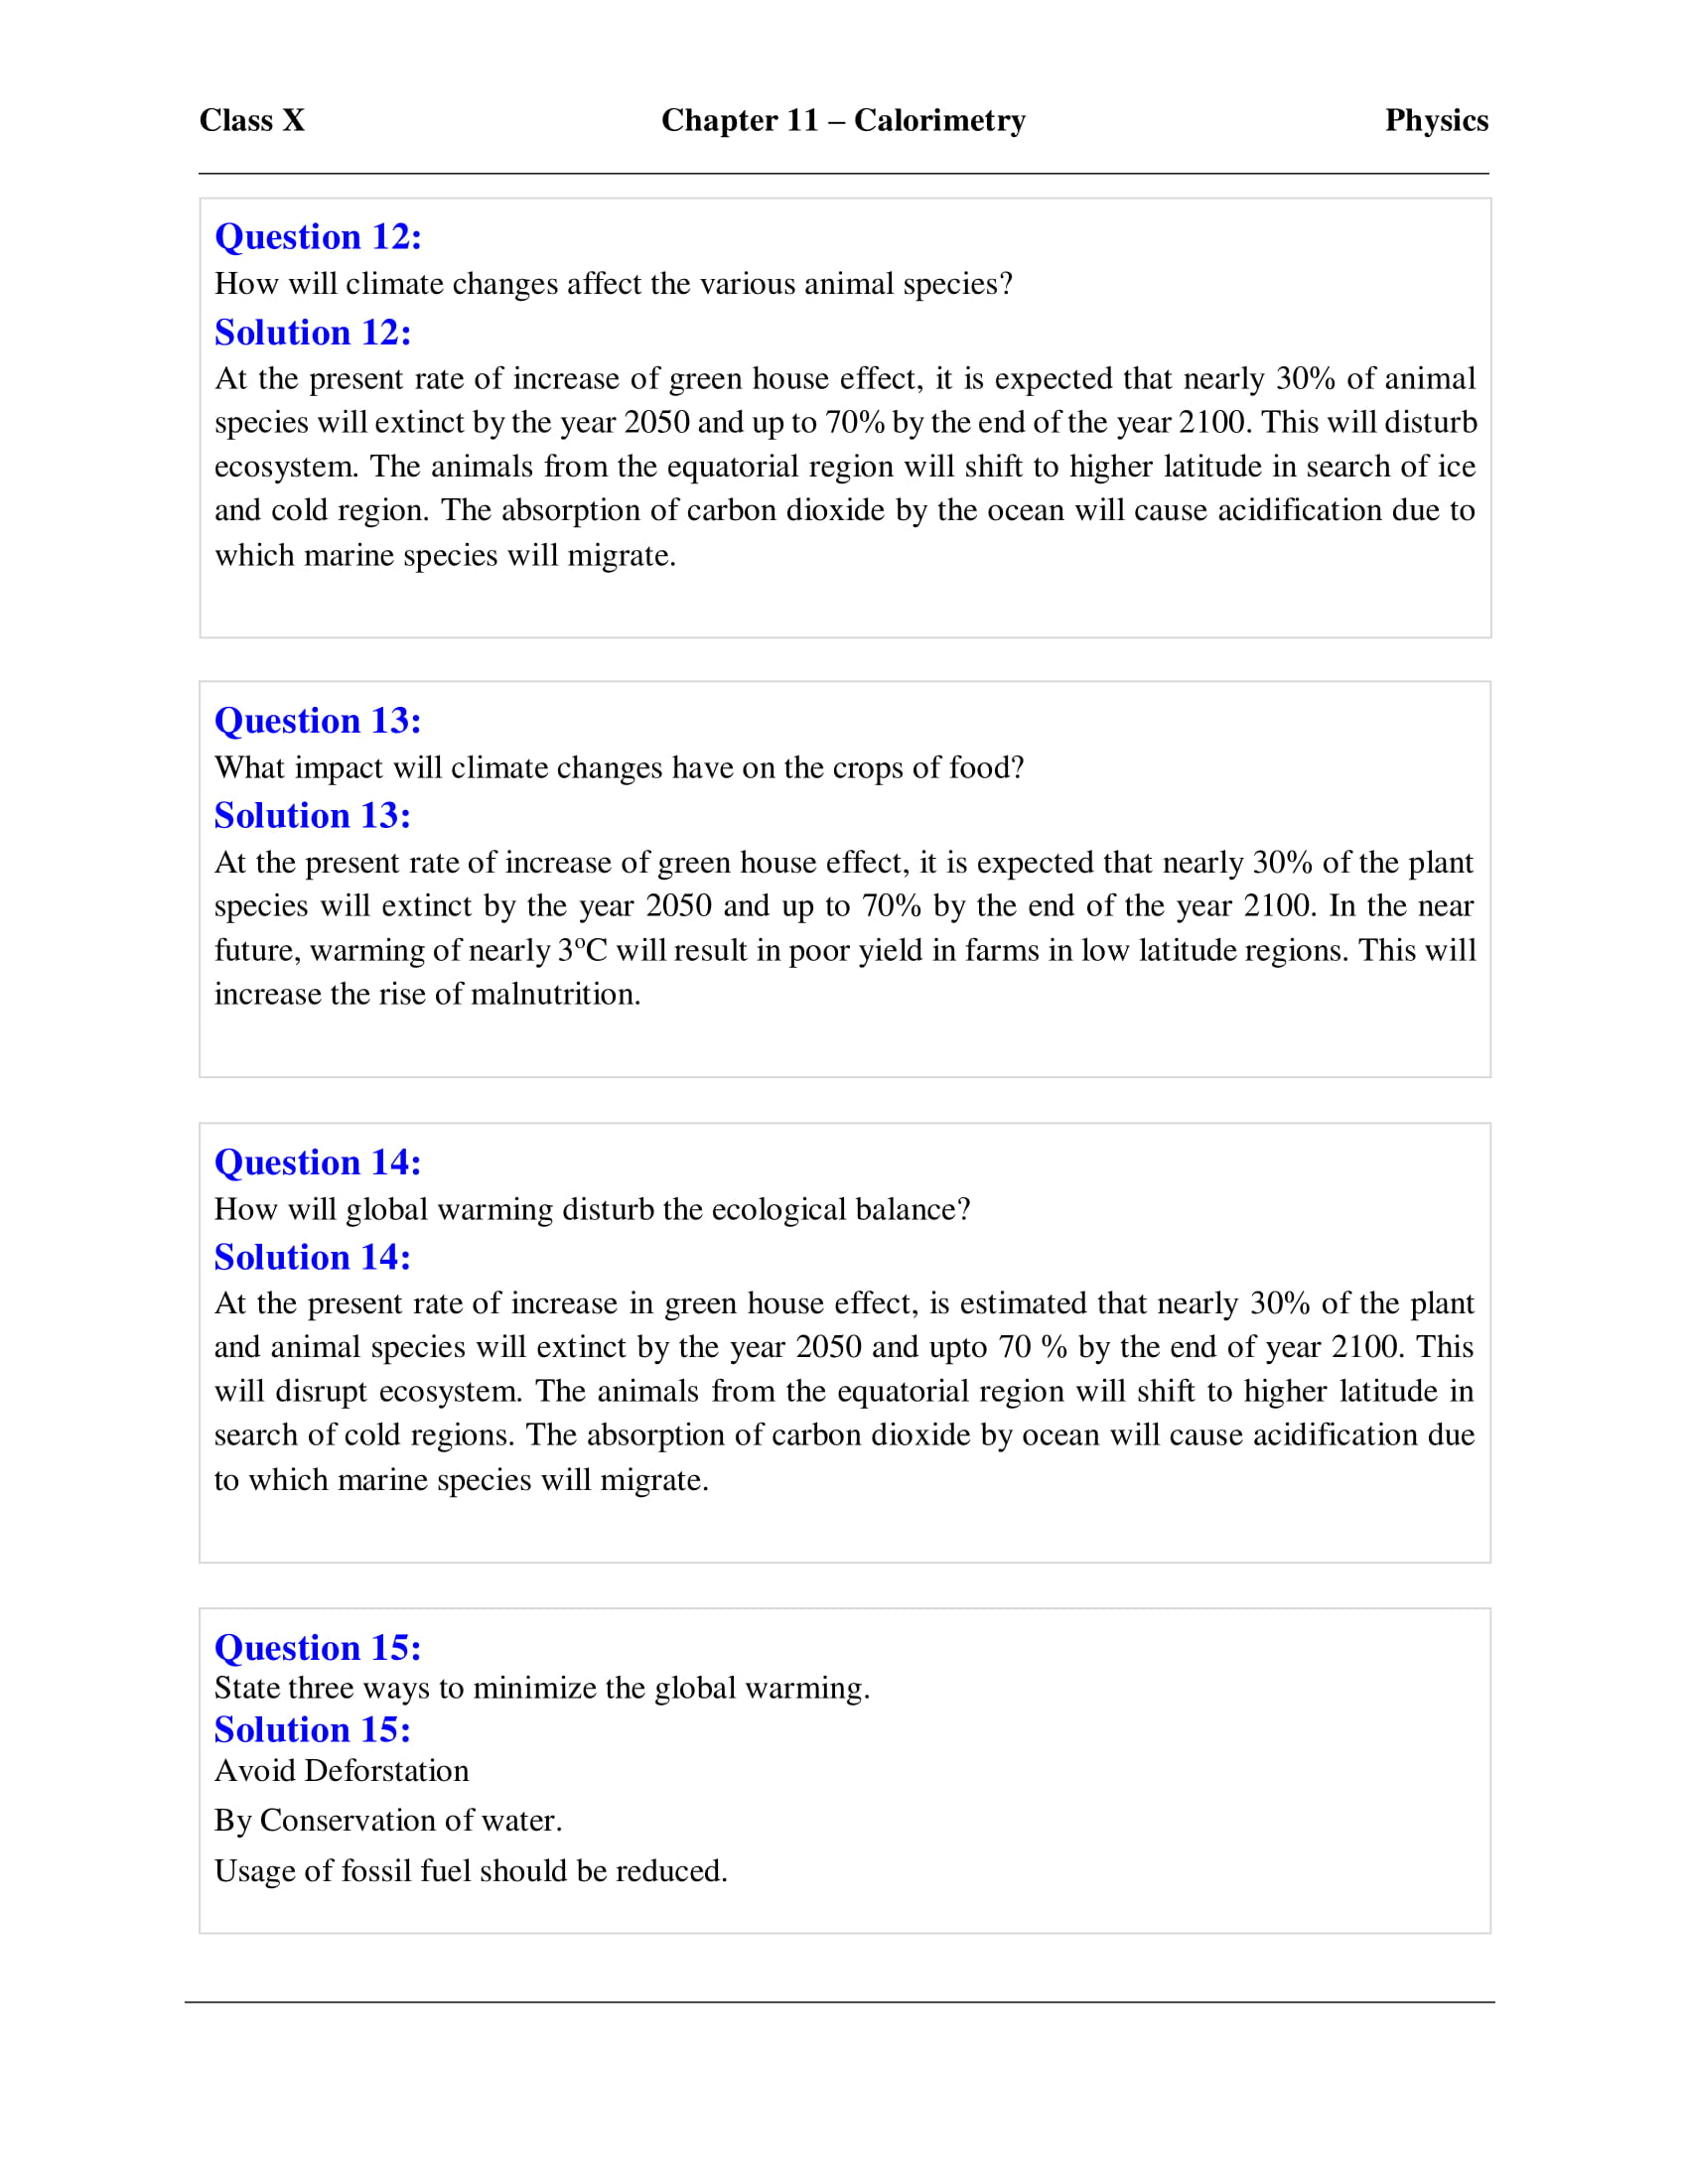 icse-selina-physics-solutions-class-10-chapter-11-calorimetry-34